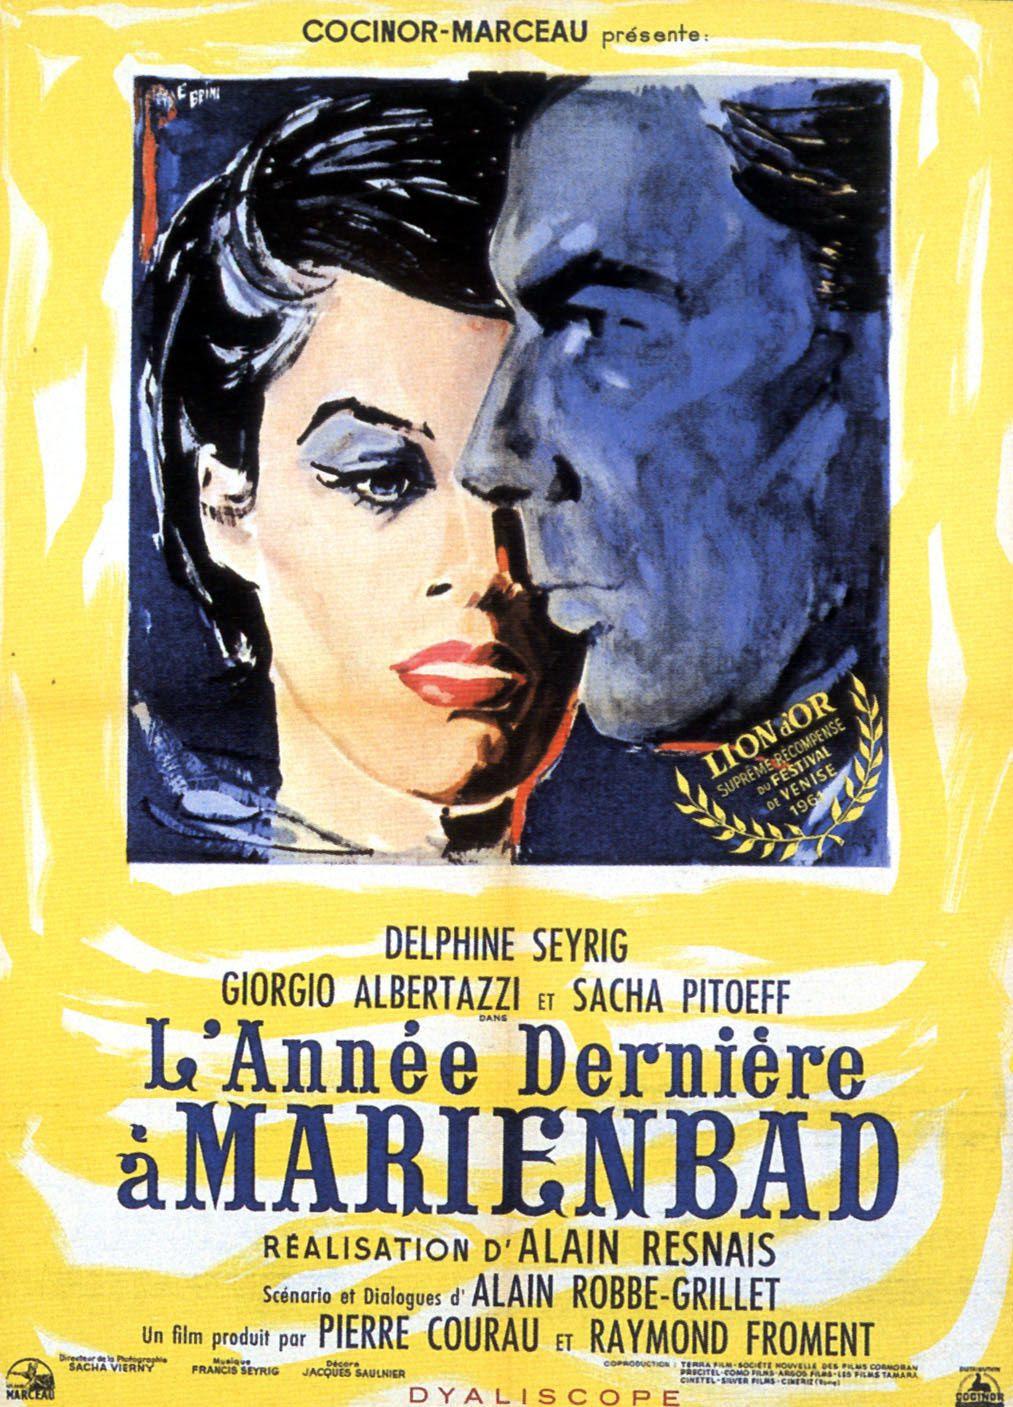 http://a405.idata.over-blog.com/3/74/47/93/affiche/Ann-E9E-Derni-E8Re--E0-Marienbad--L-.jpg